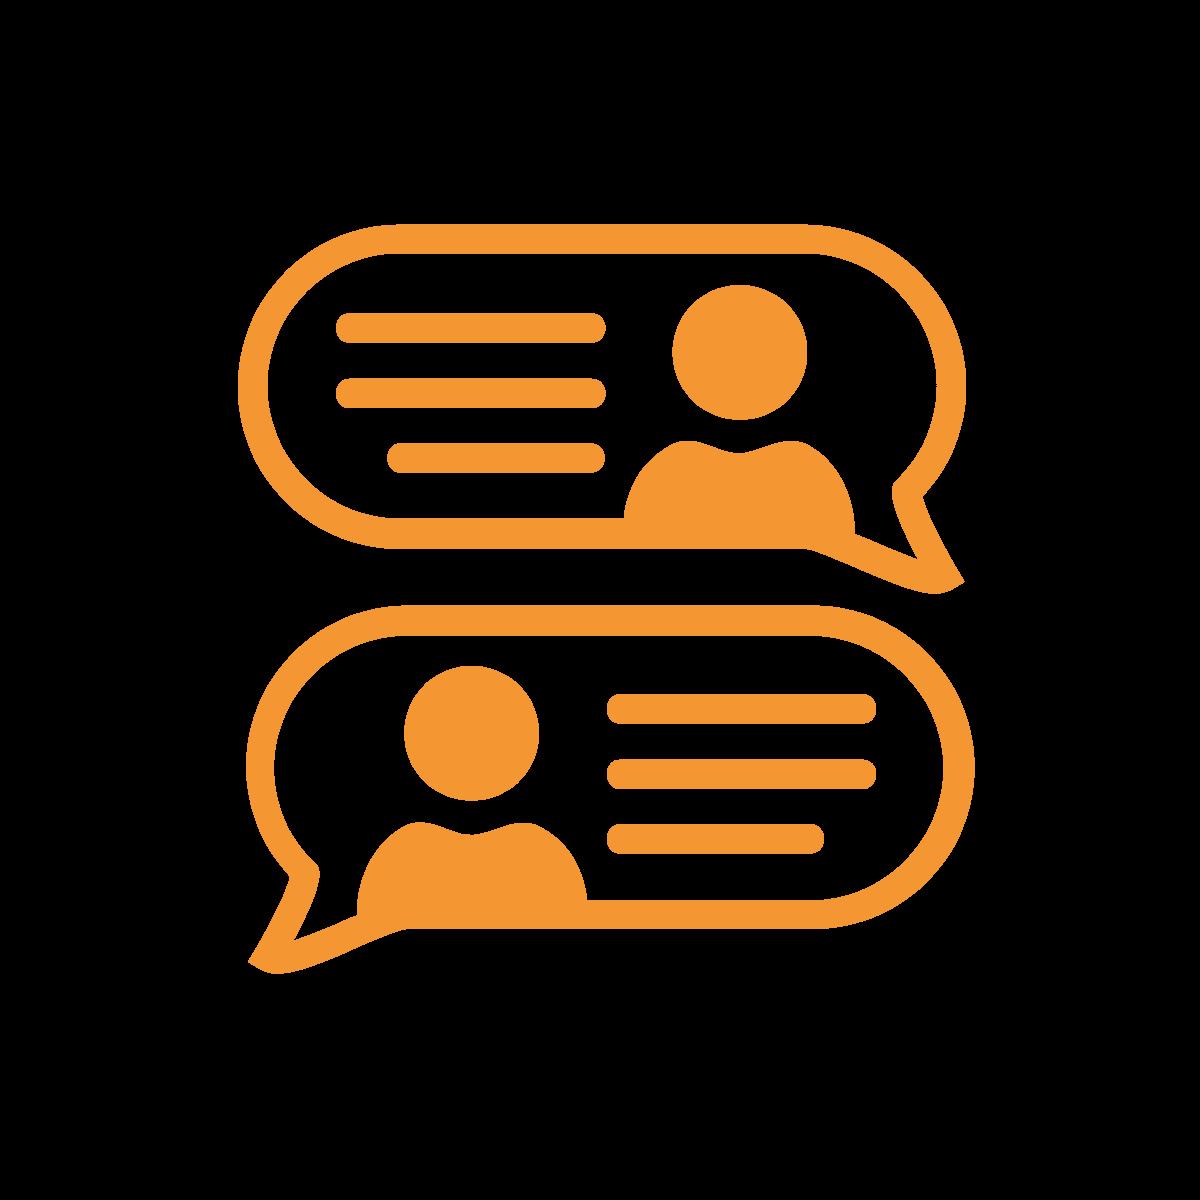 icon-monitor-social-media